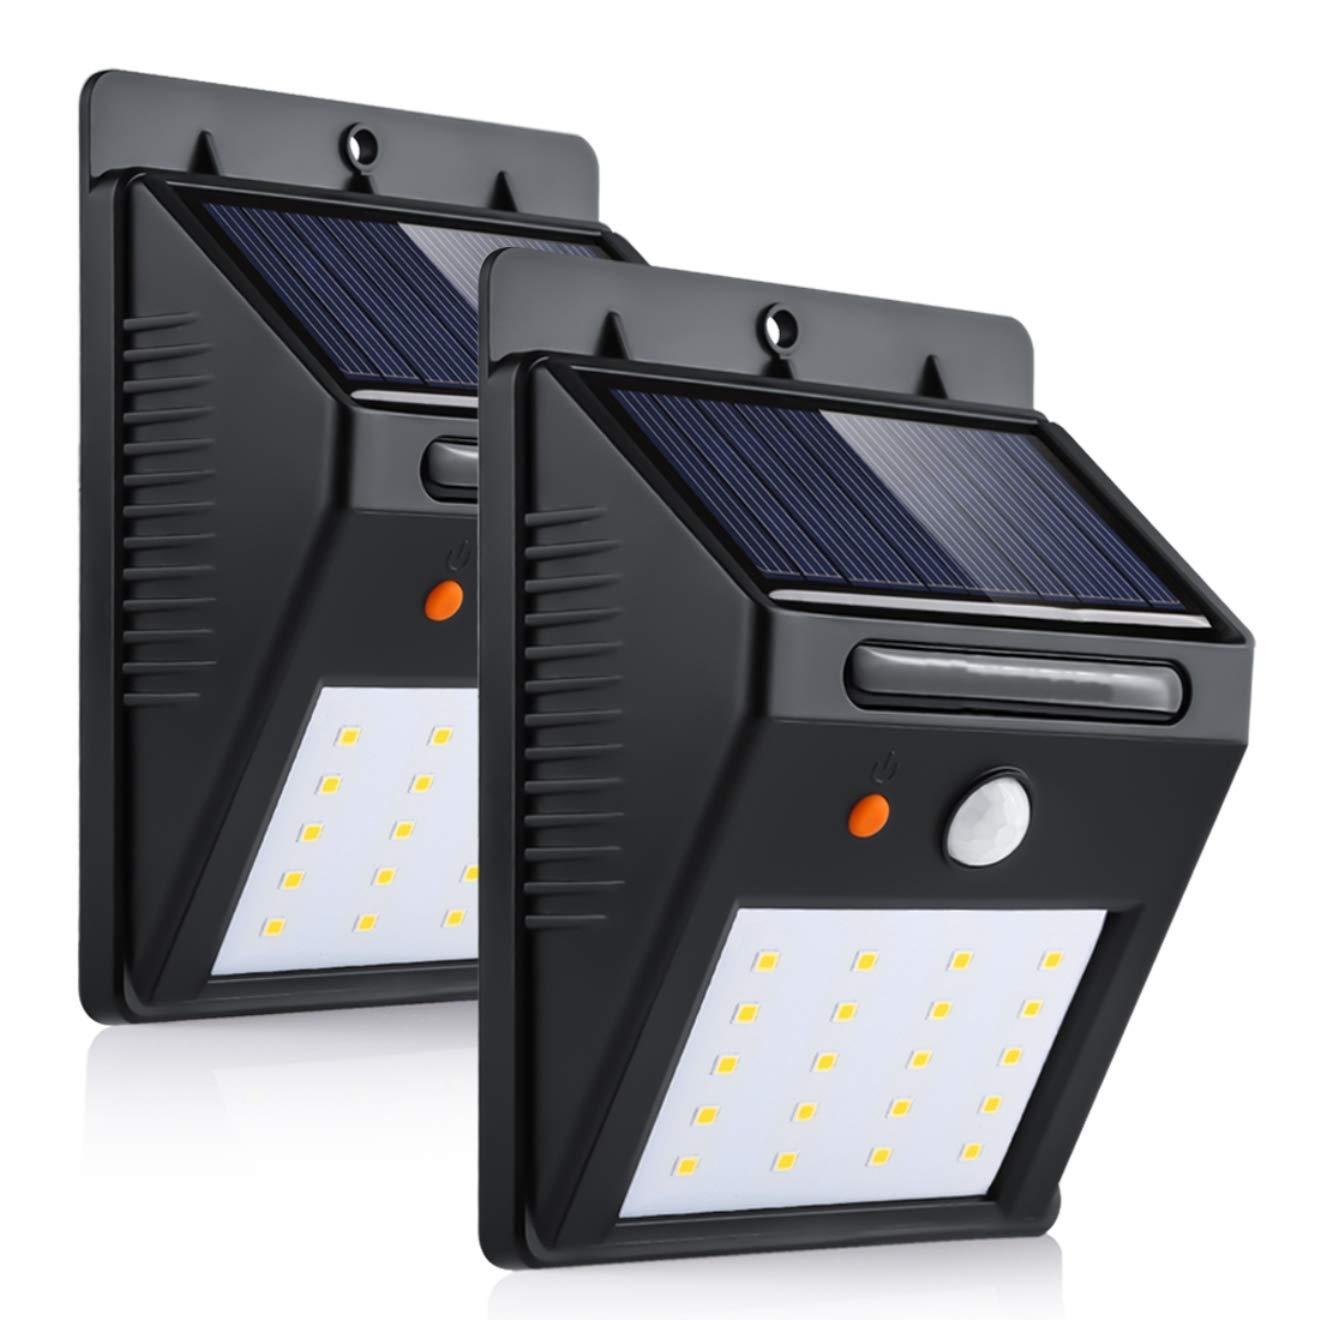 Luz de Solar 3 modos 20LED Luces Solares LED de Pared Sensor de Movimiento Super Brillante Impermeable Inteligentes para al Aire Libre, Jardín, Cerca, ...